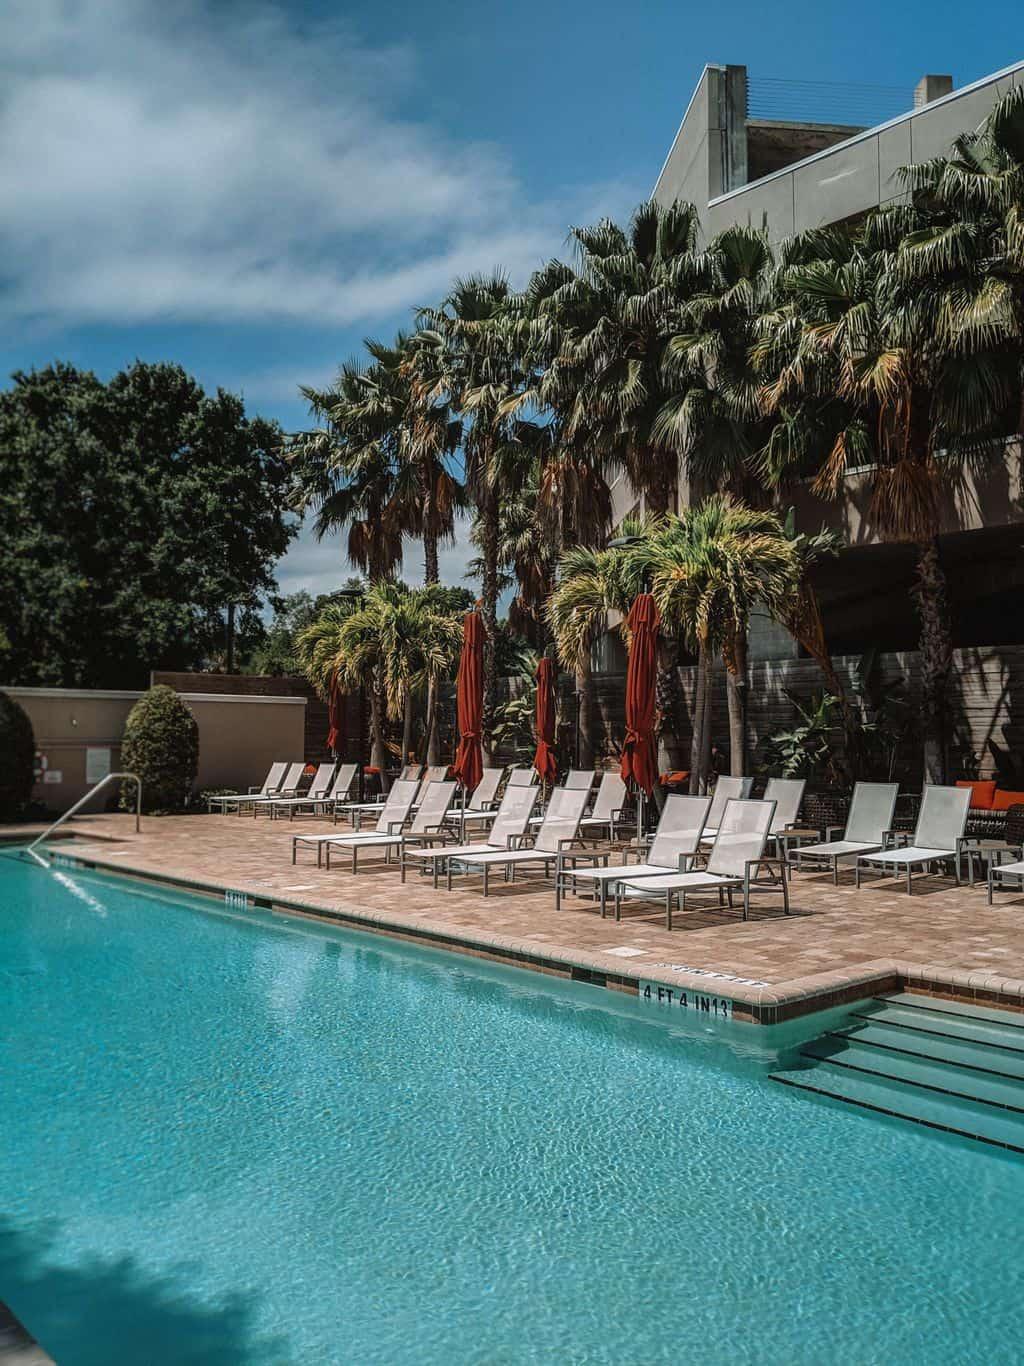 The Epicurean Hotel Swimming Pool SoHo Tampa restaurants